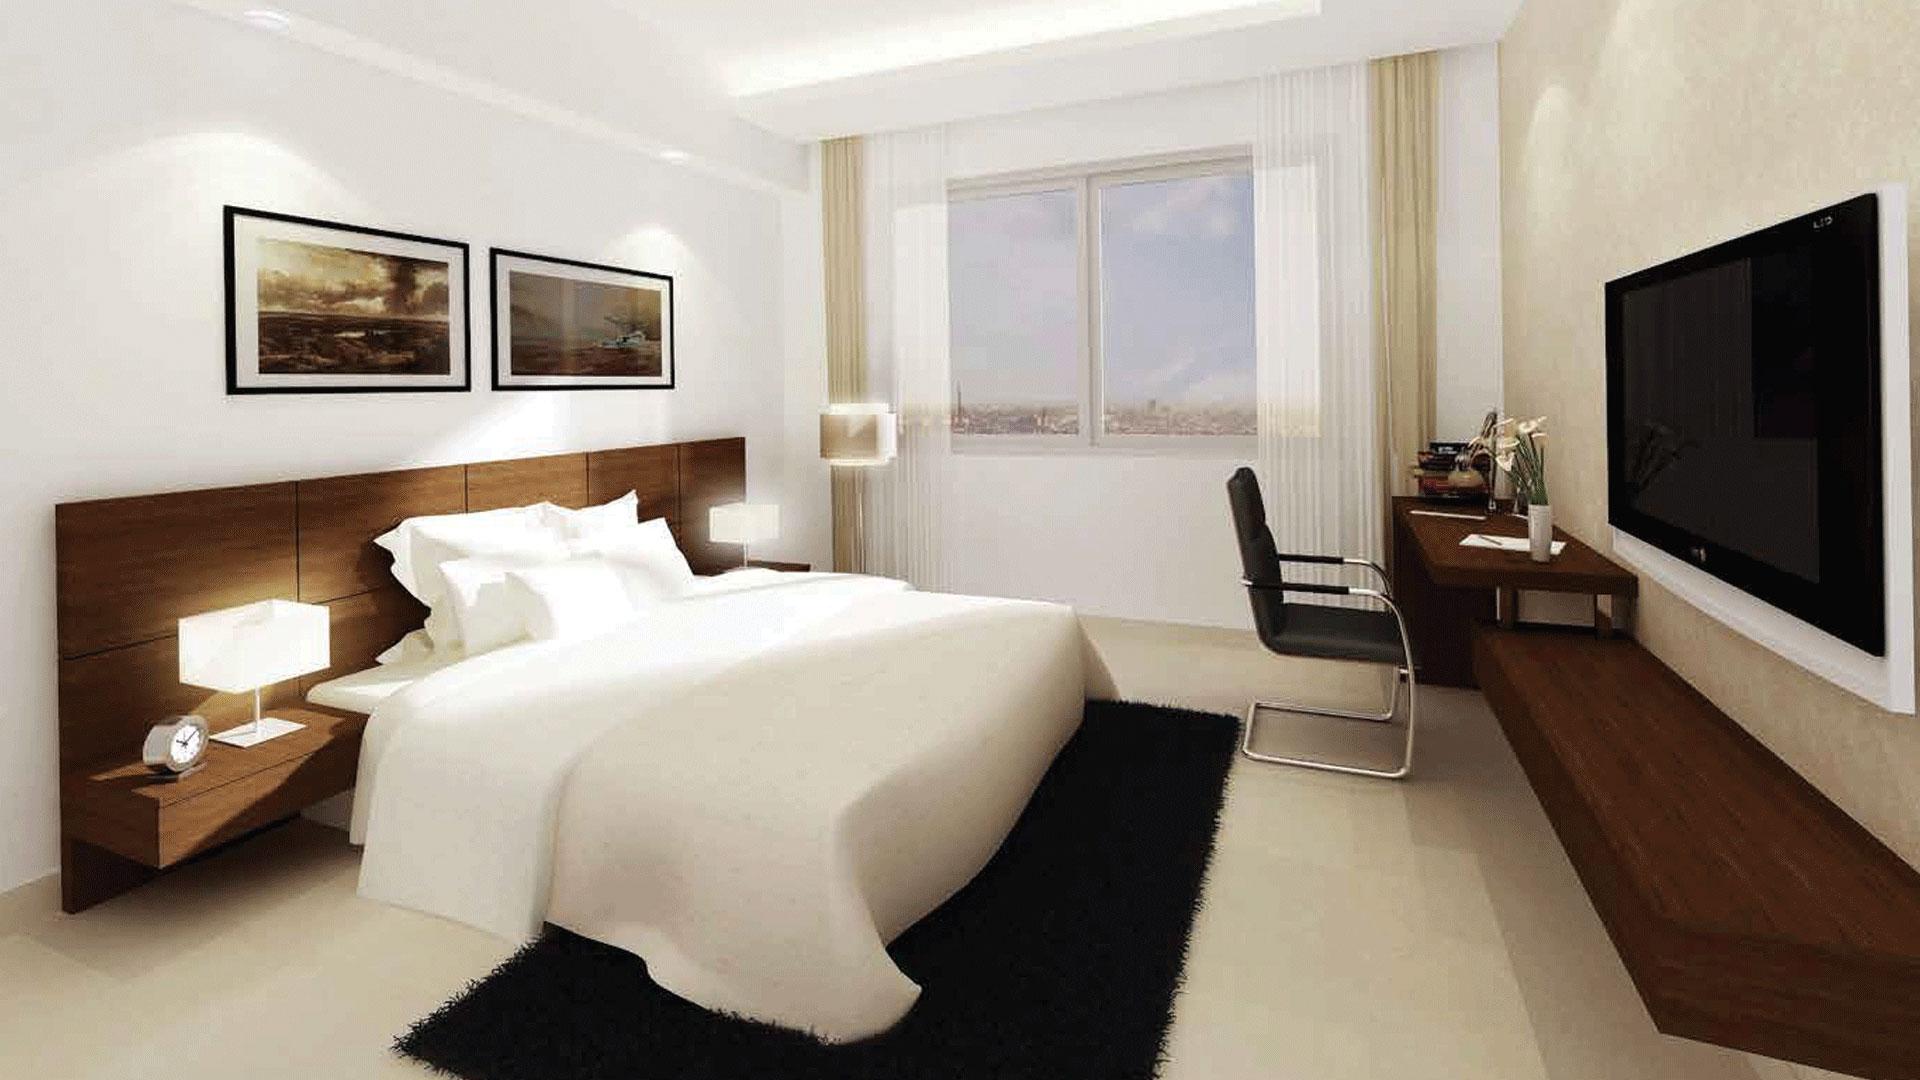 Prestige-MSR-Apartment-Devasandra-Layout-Bangalore-Image-04